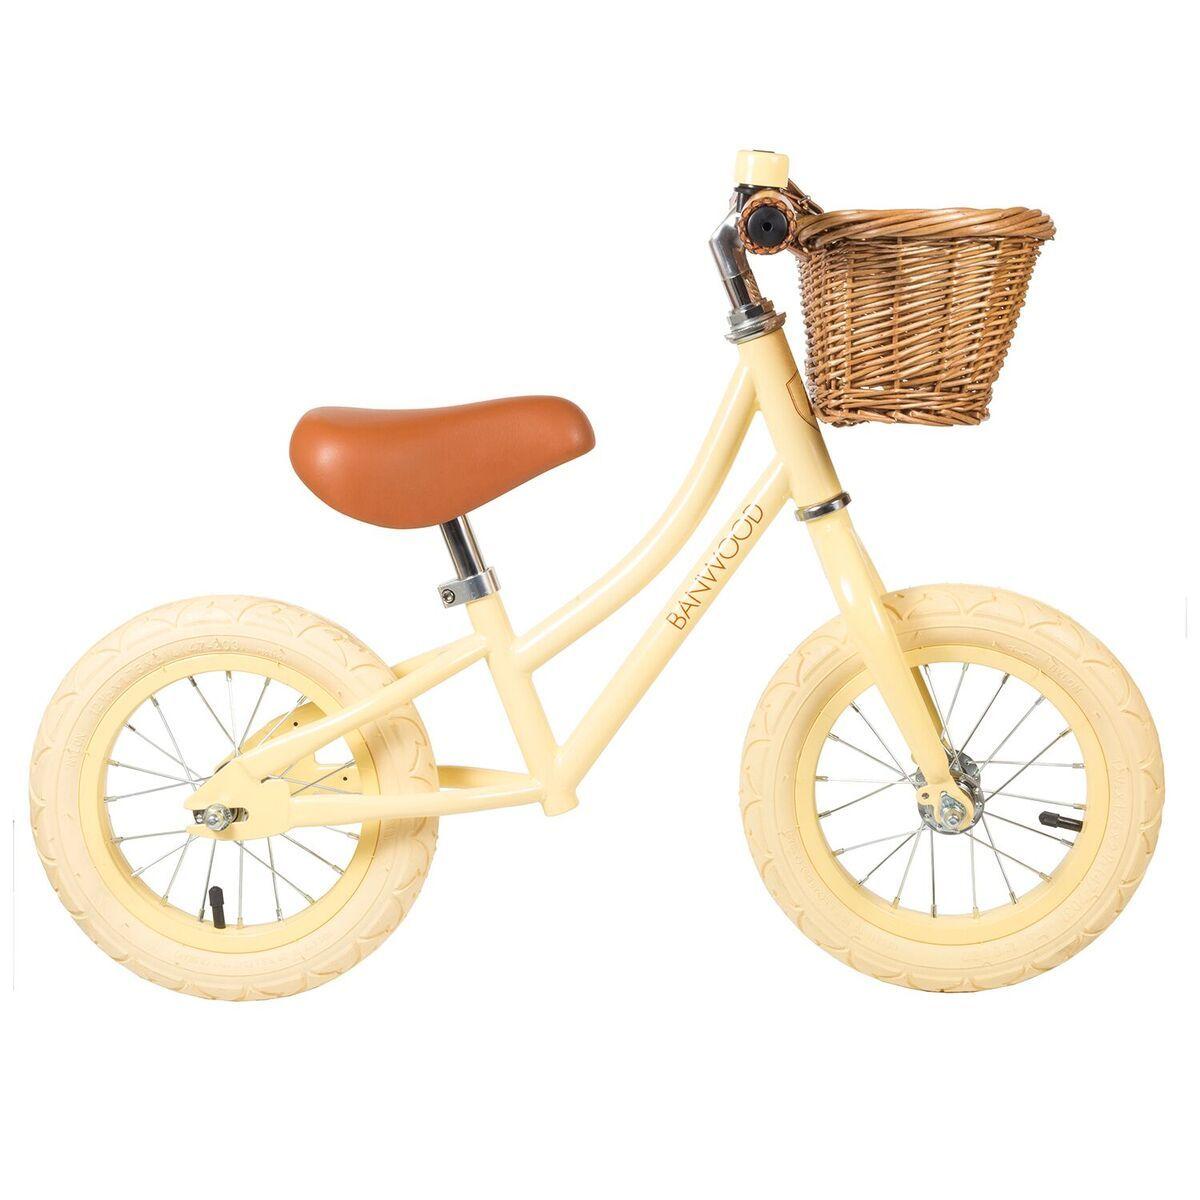 Banwood Laufrad Firstgo Vanille Laufrad Laufrad Kinder Und